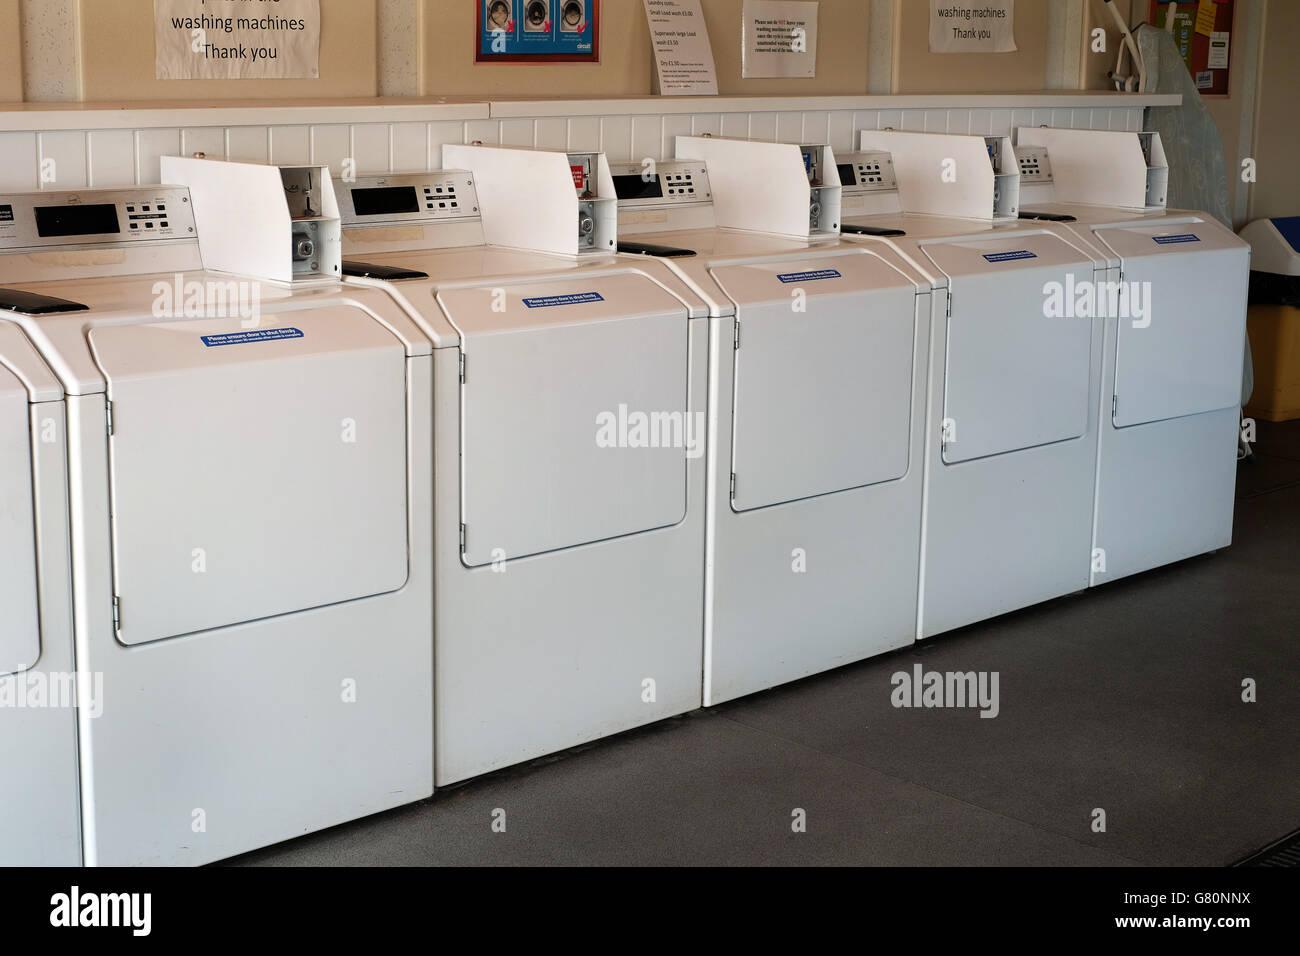 Washing Machines Stock Photos & Washing Machines Stock